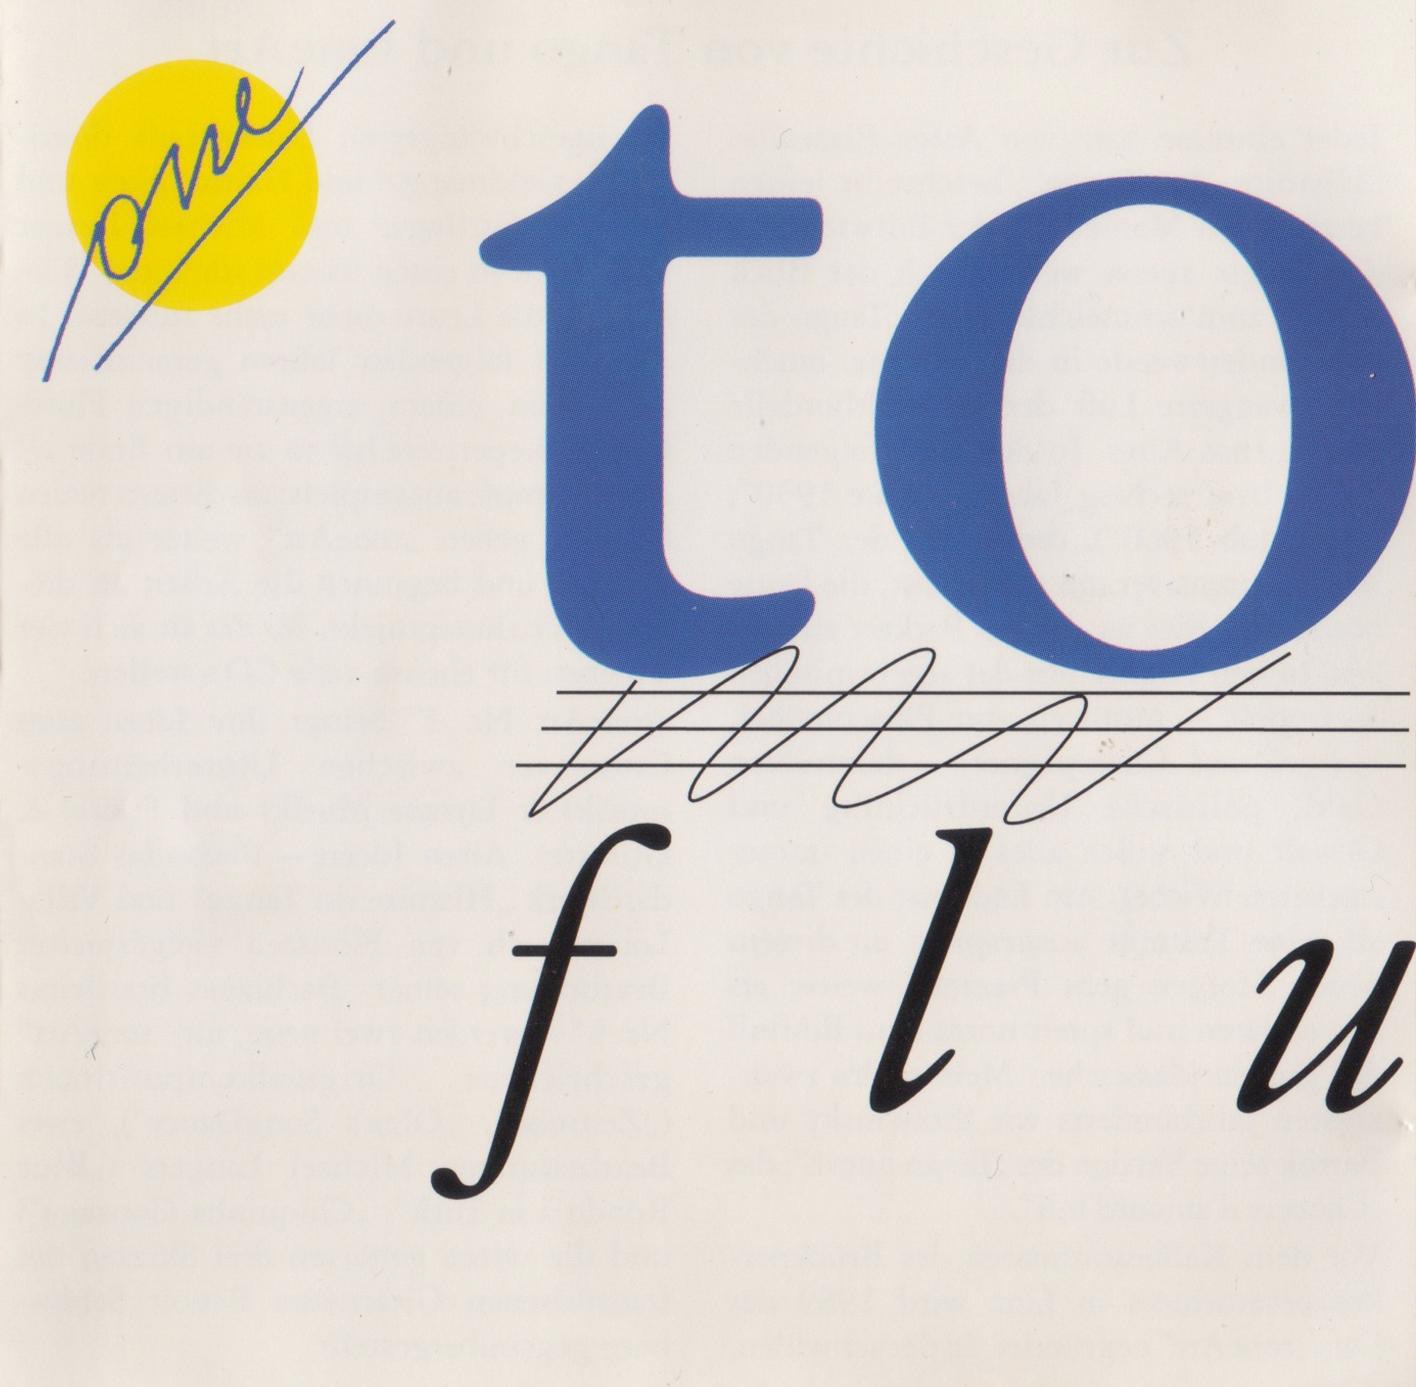 CD toneArt